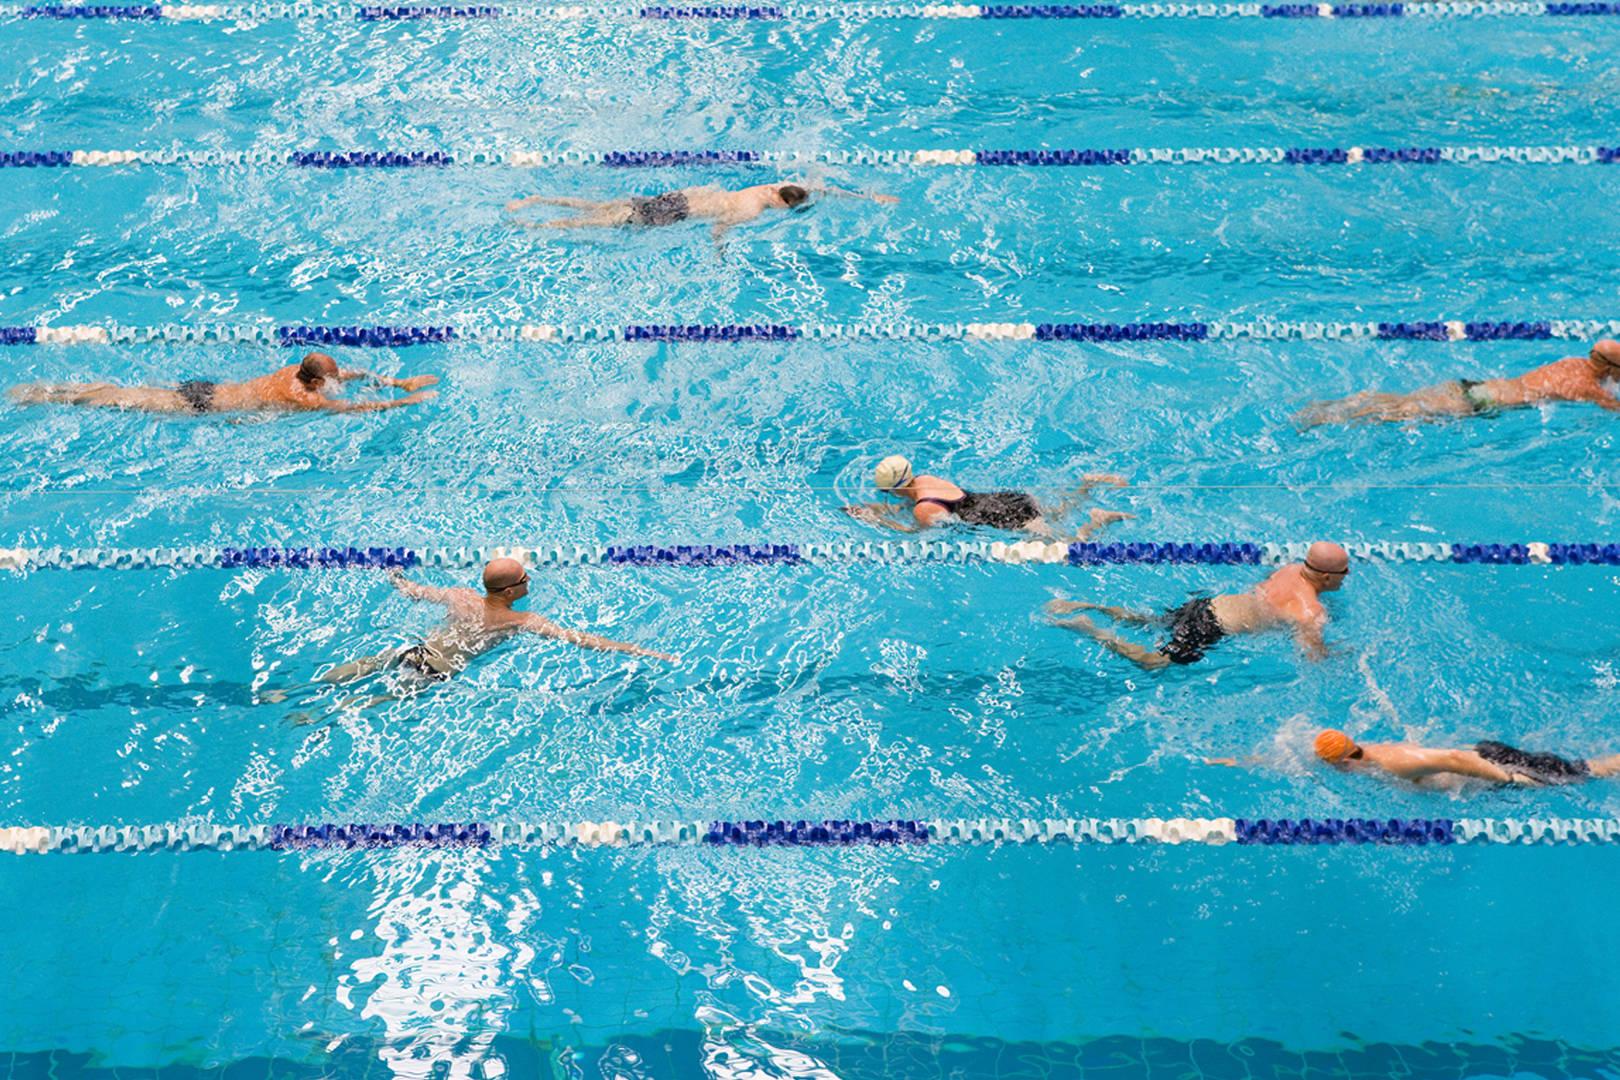 Lap Swimming At The Aquatic Centre Sydney Olympic Park